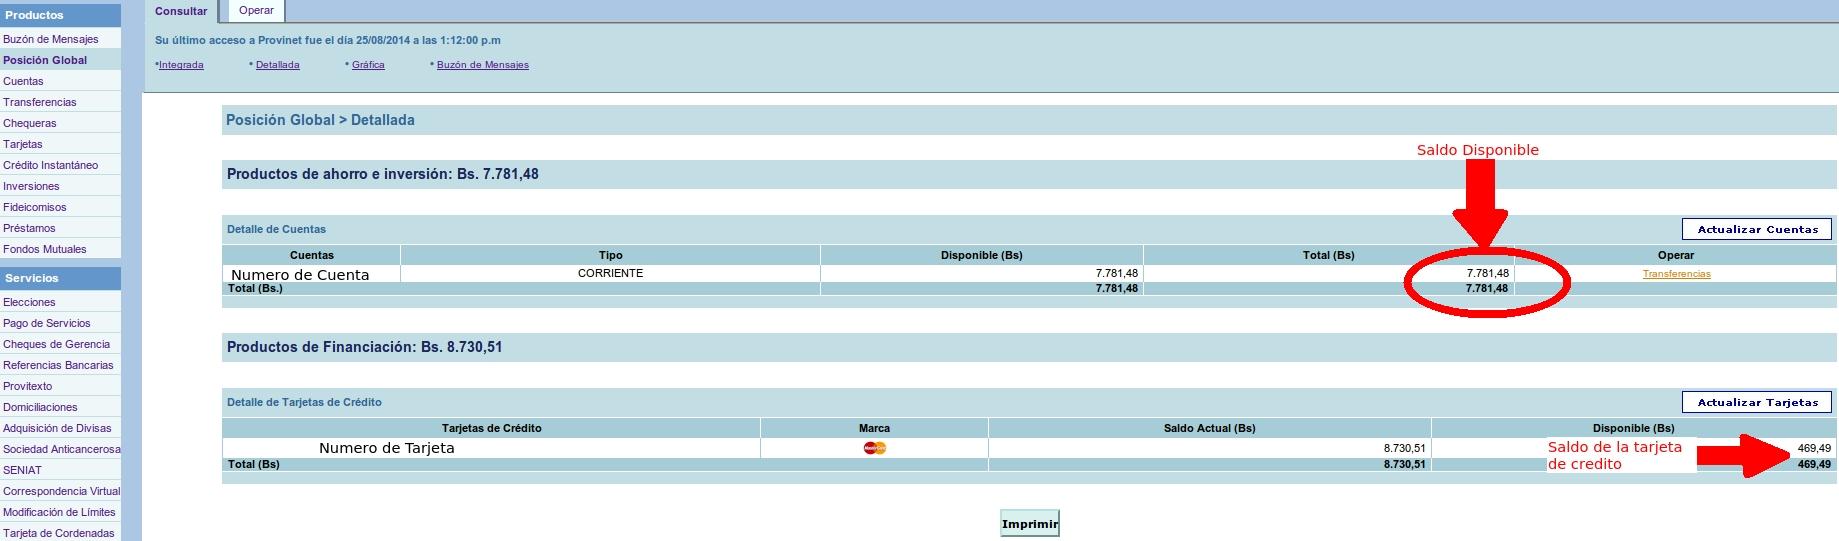 Banco provincial consulta de saldo en l nea for Banesco online consulta de saldo cuenta de ahorro